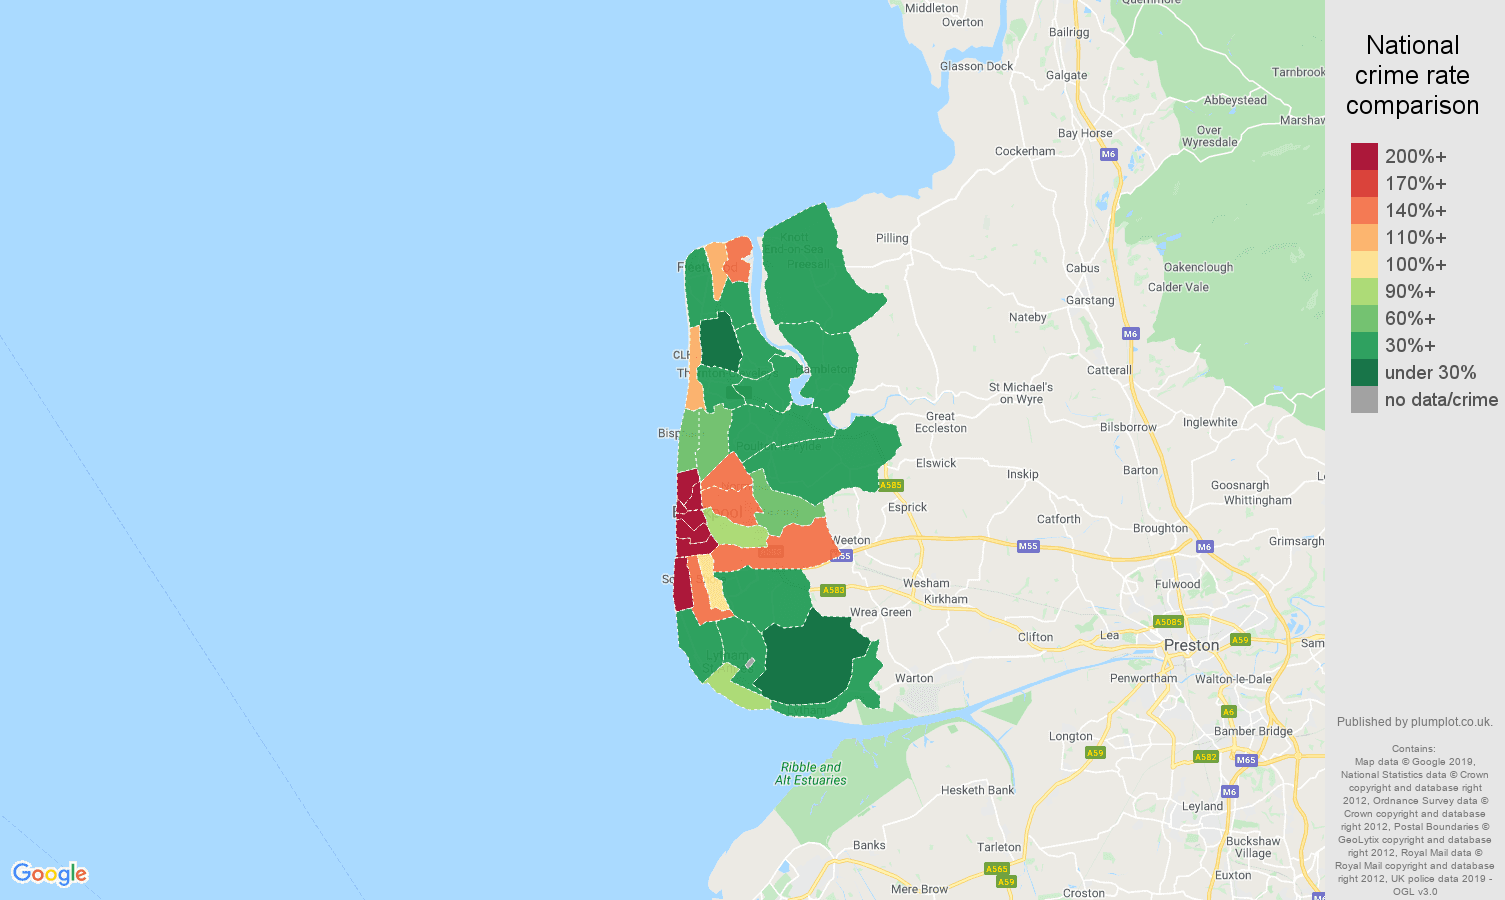 Blackpool public order crime rate comparison map